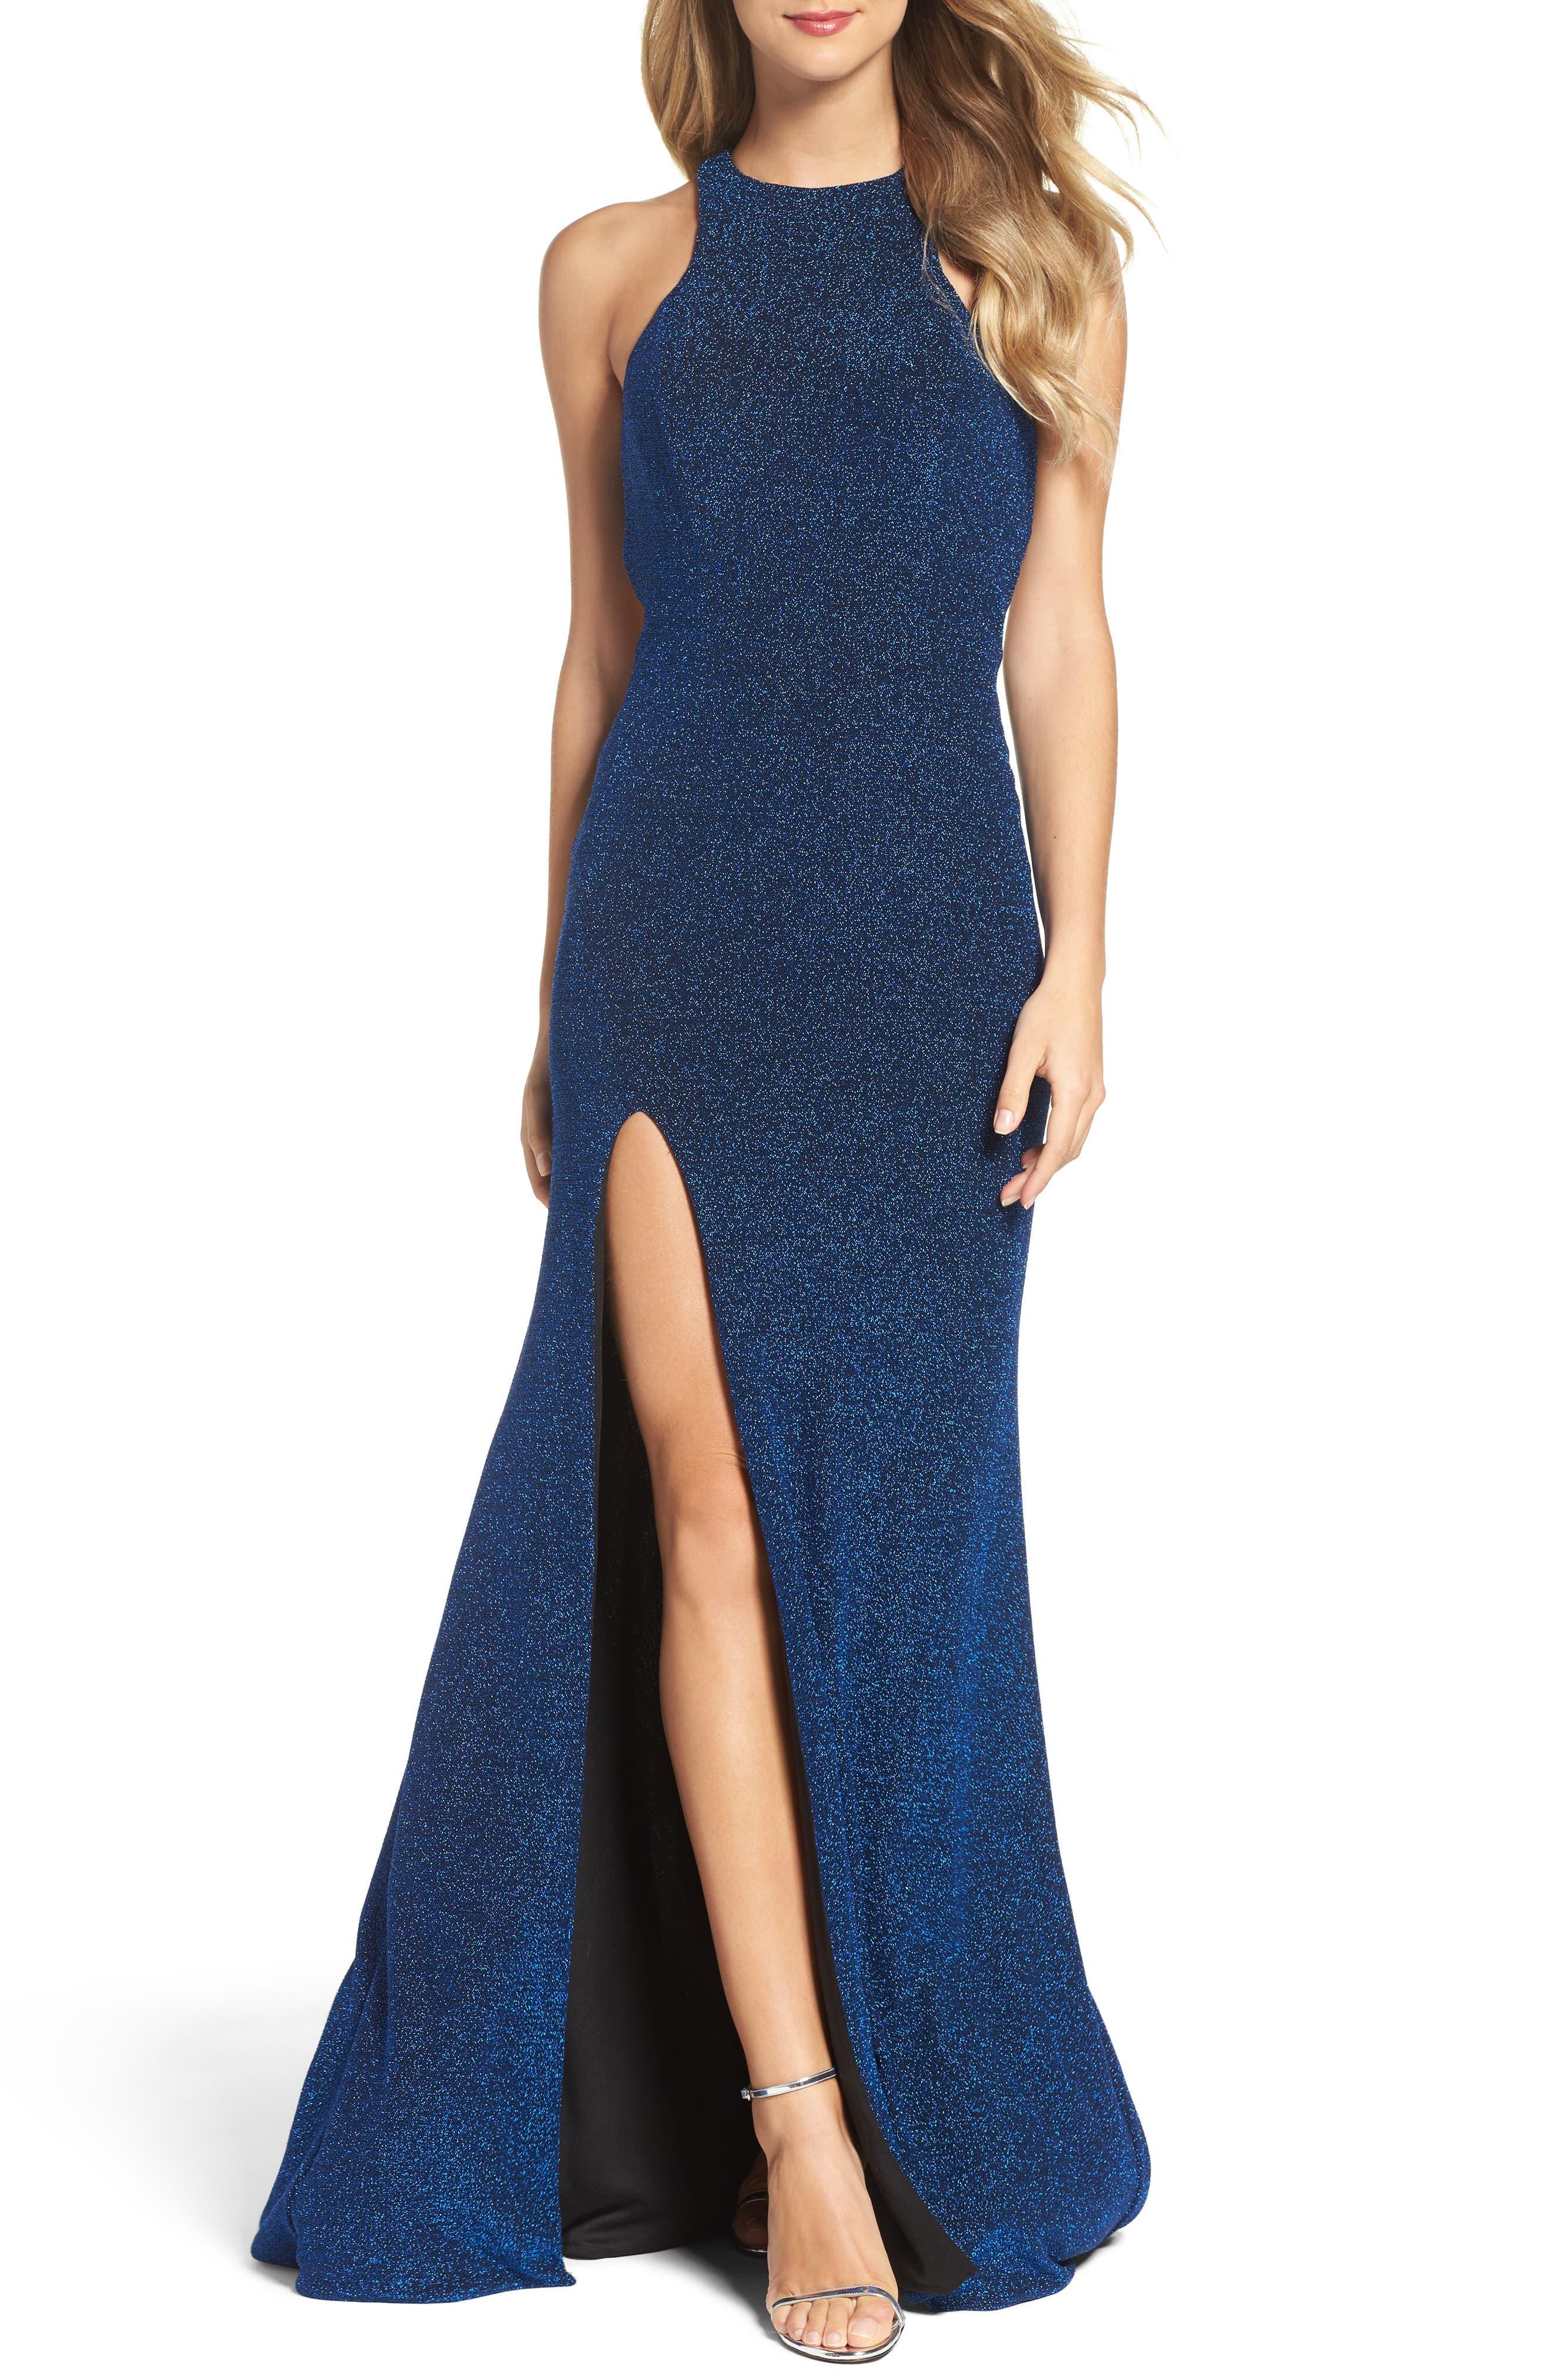 Alternate Image 1 Selected - La Femme Cutout Metallic Jersey Gown